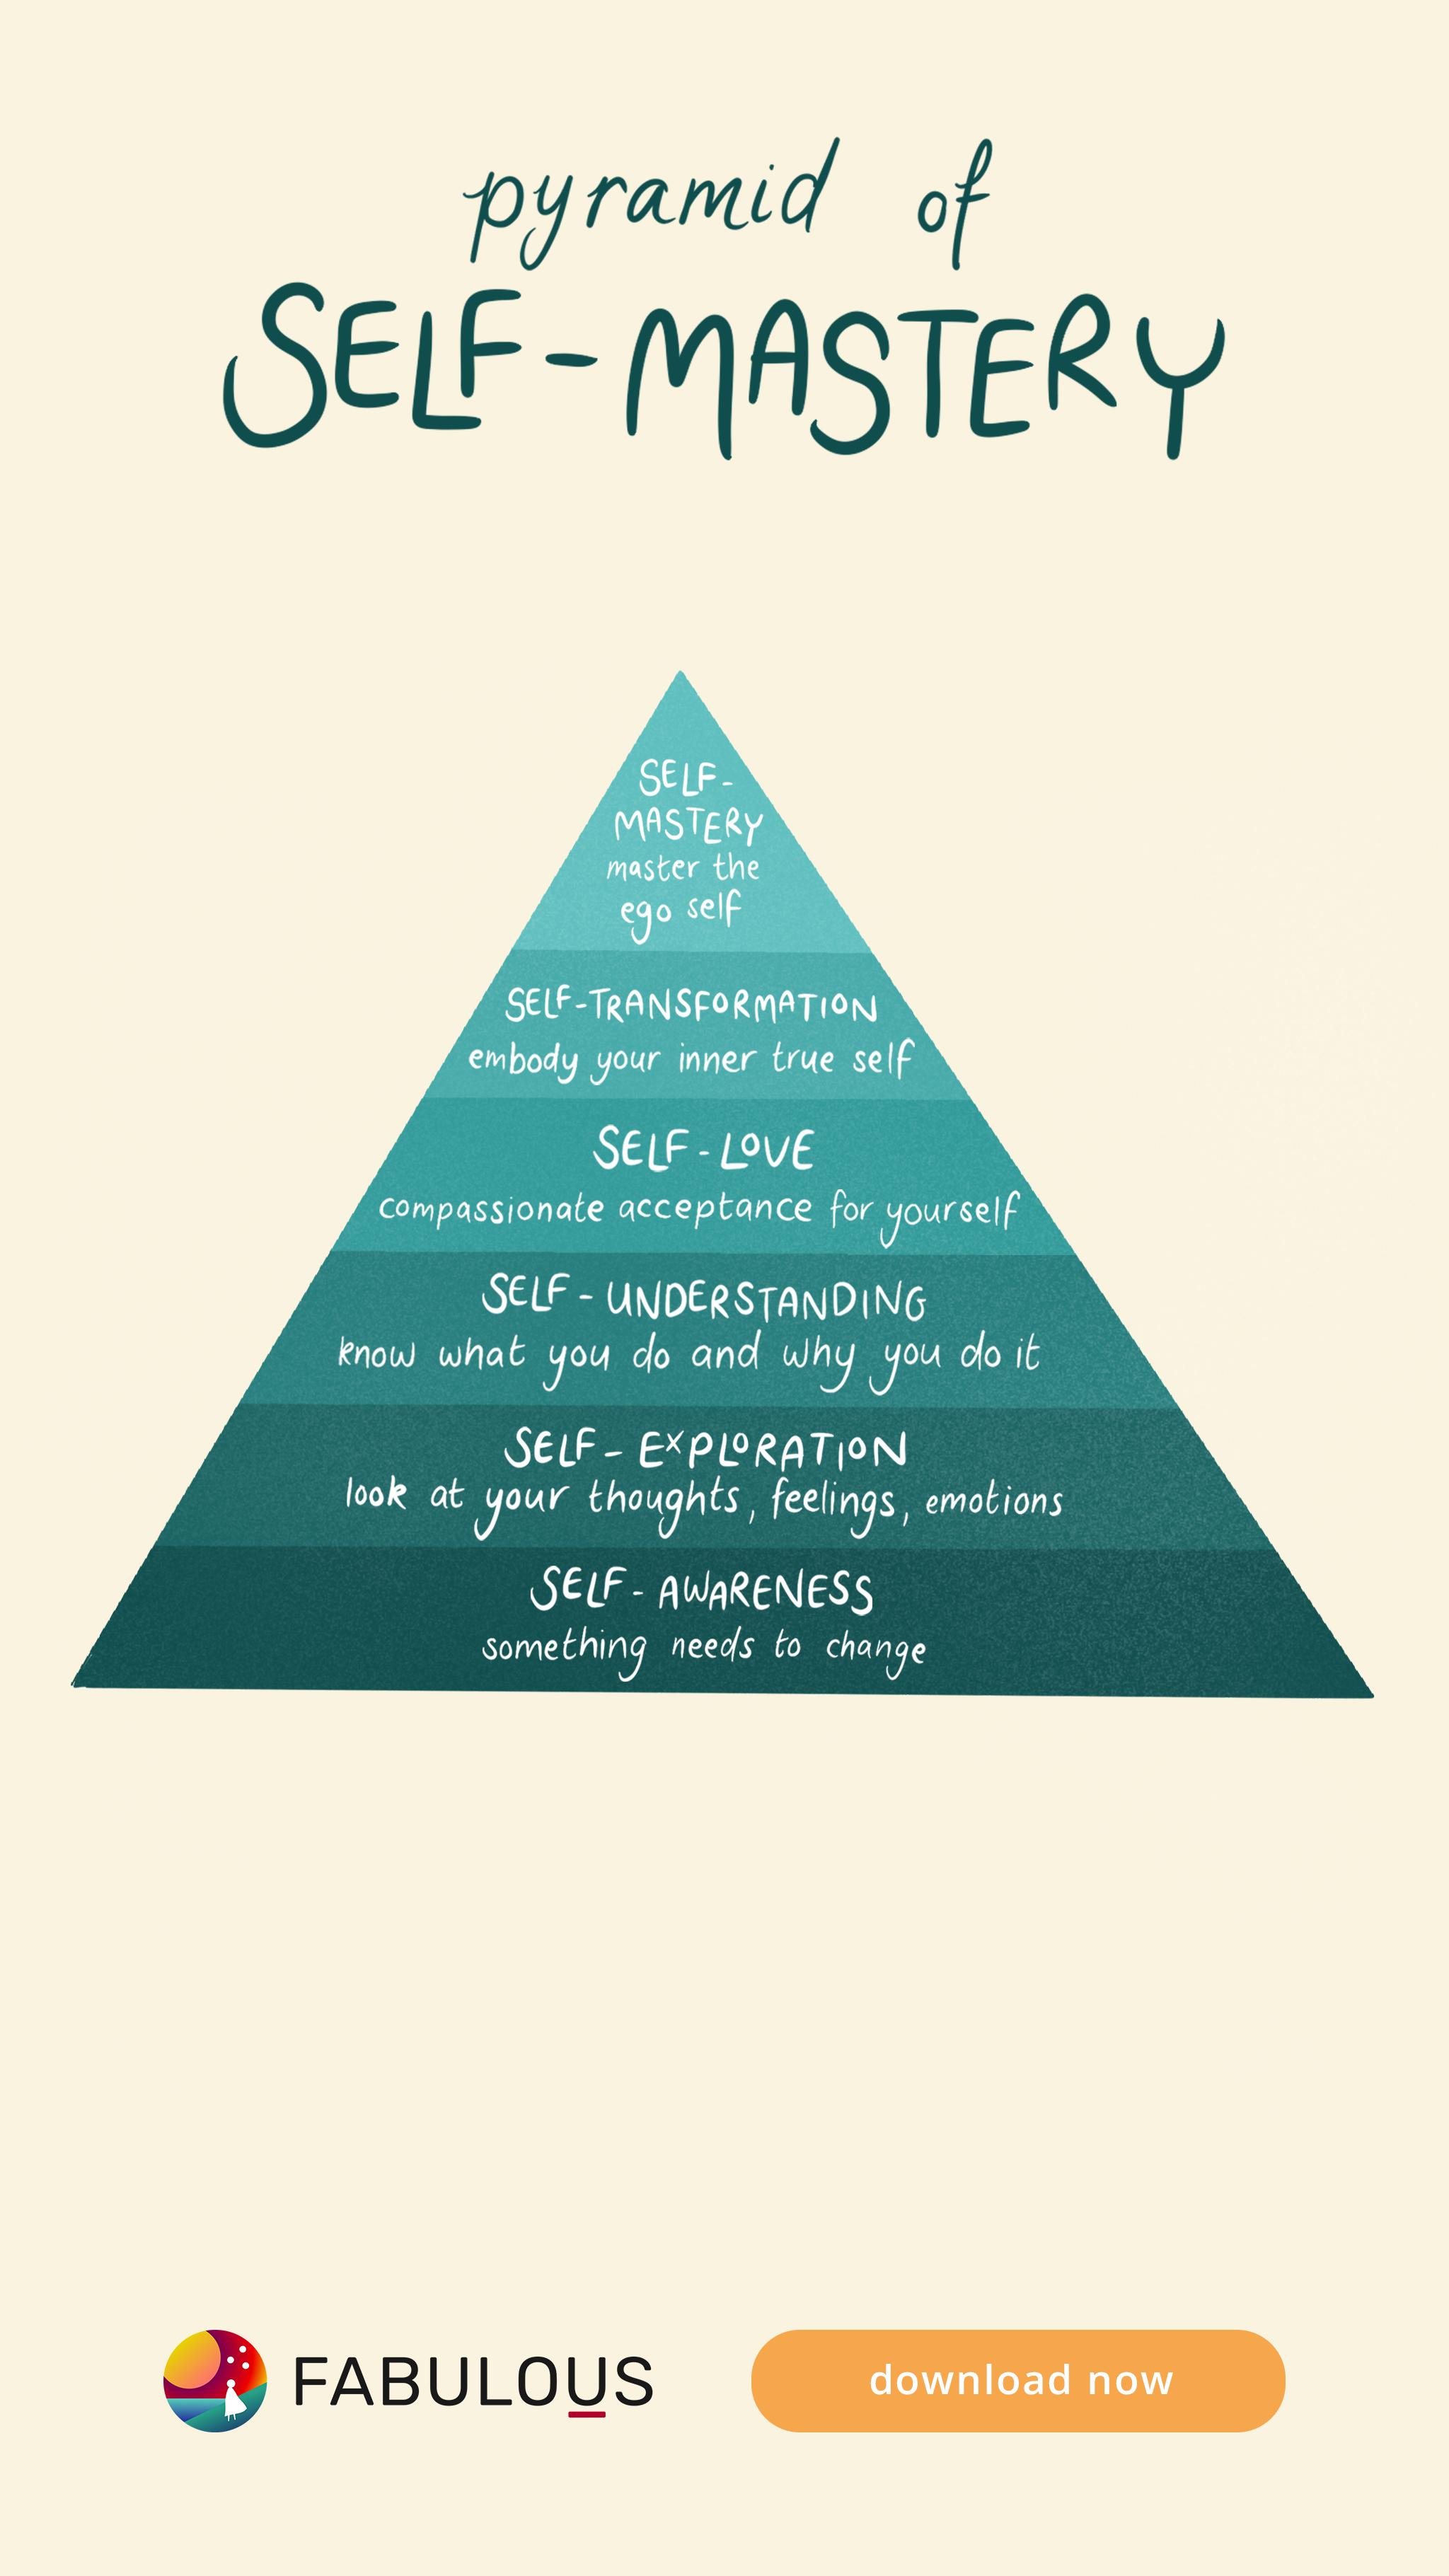 Pyramid of Self Mastery